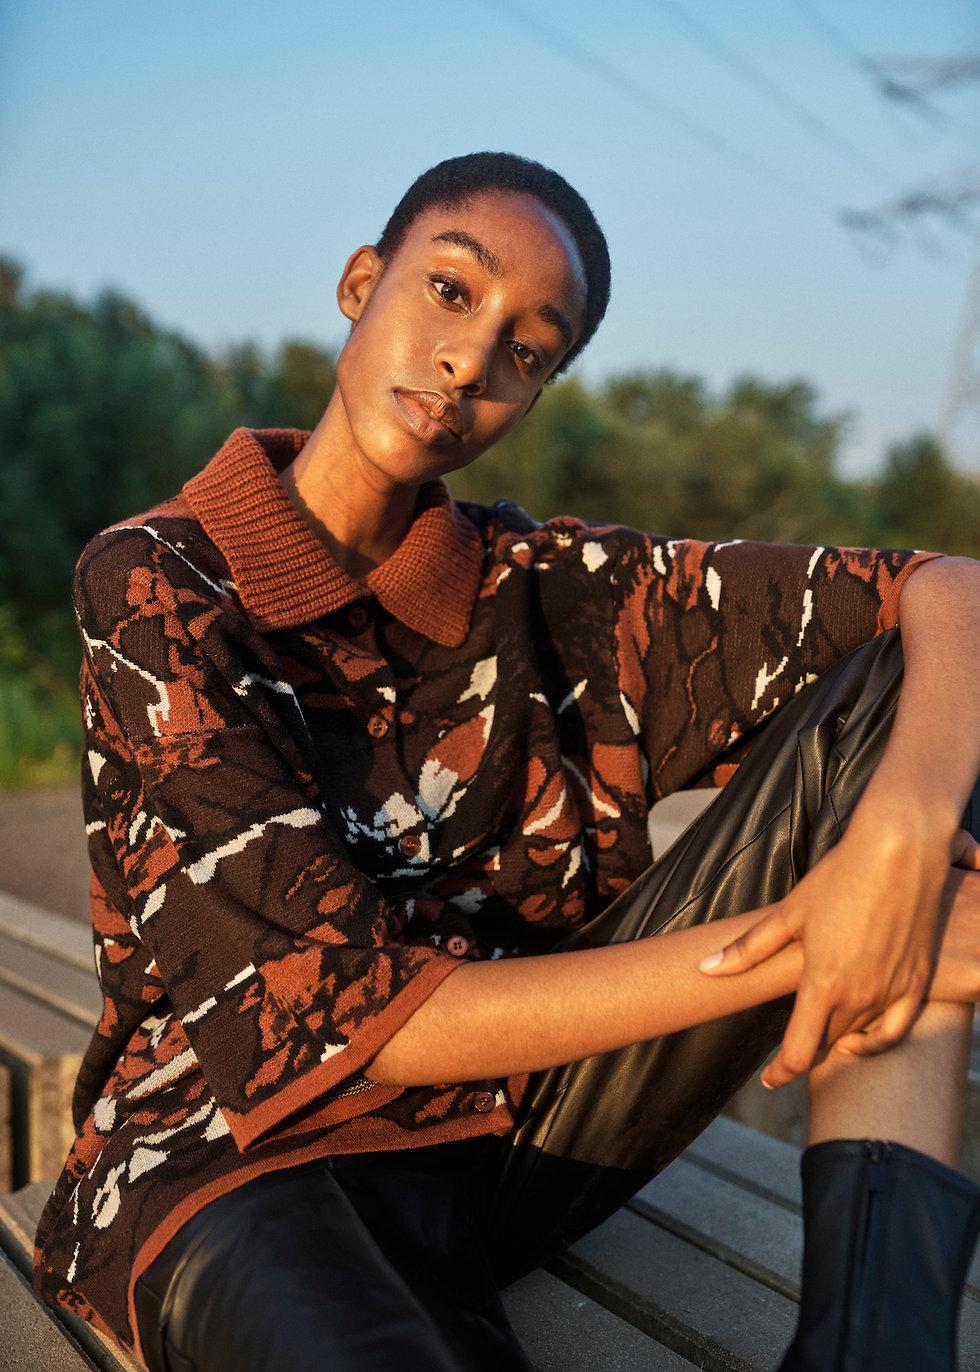 Valerie Ntantu_Latoyah_Pim van Baalen 4.